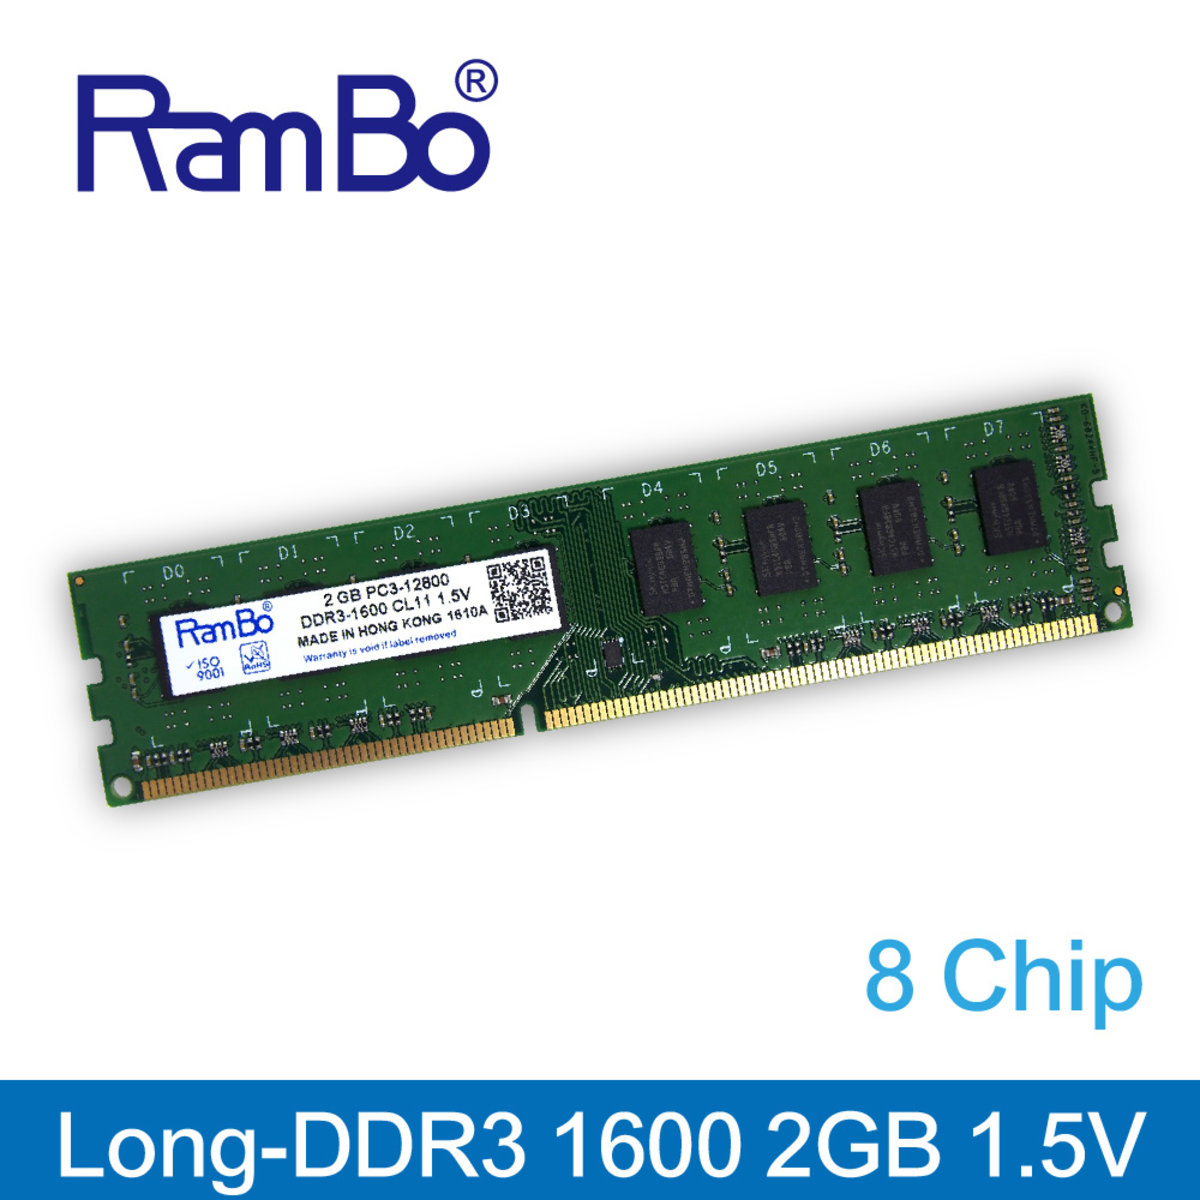 2GB DDR3 1600MHz Long DIMM 8-Chip 1.35-1.5V Memory for PC Desktop